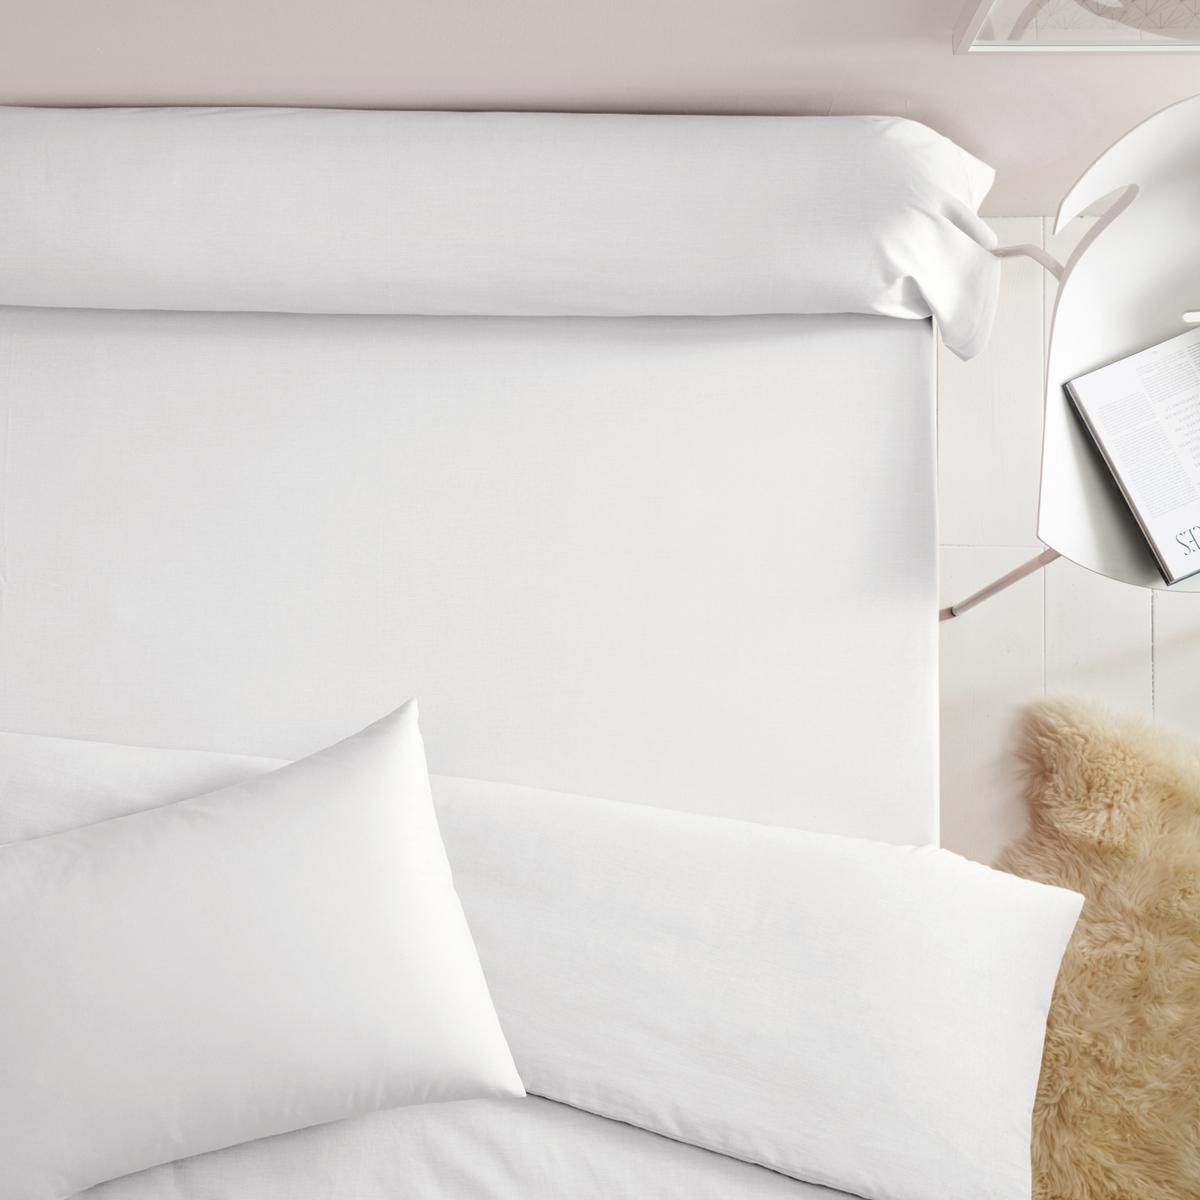 SCENARIO Наволочка на подушку-валик из полиэстера и хлопка (поликоттон)